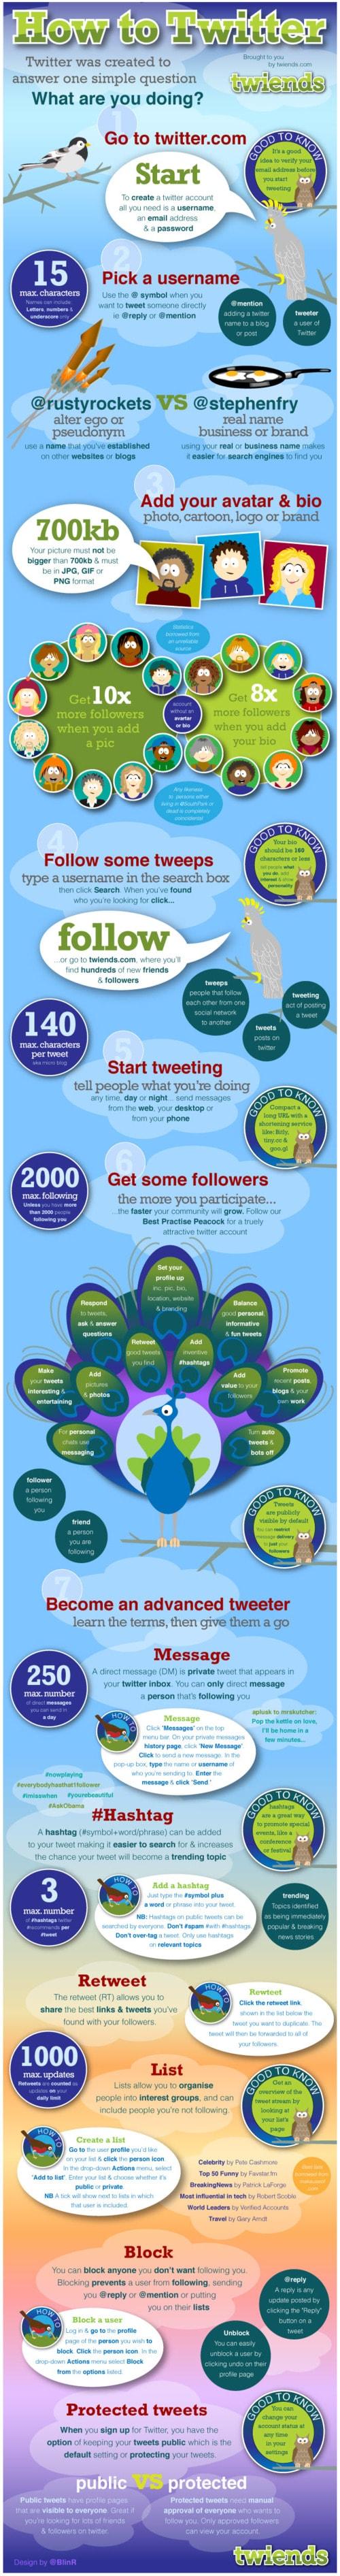 How to Use Twitter  via @jeffbullas via Blake Myers